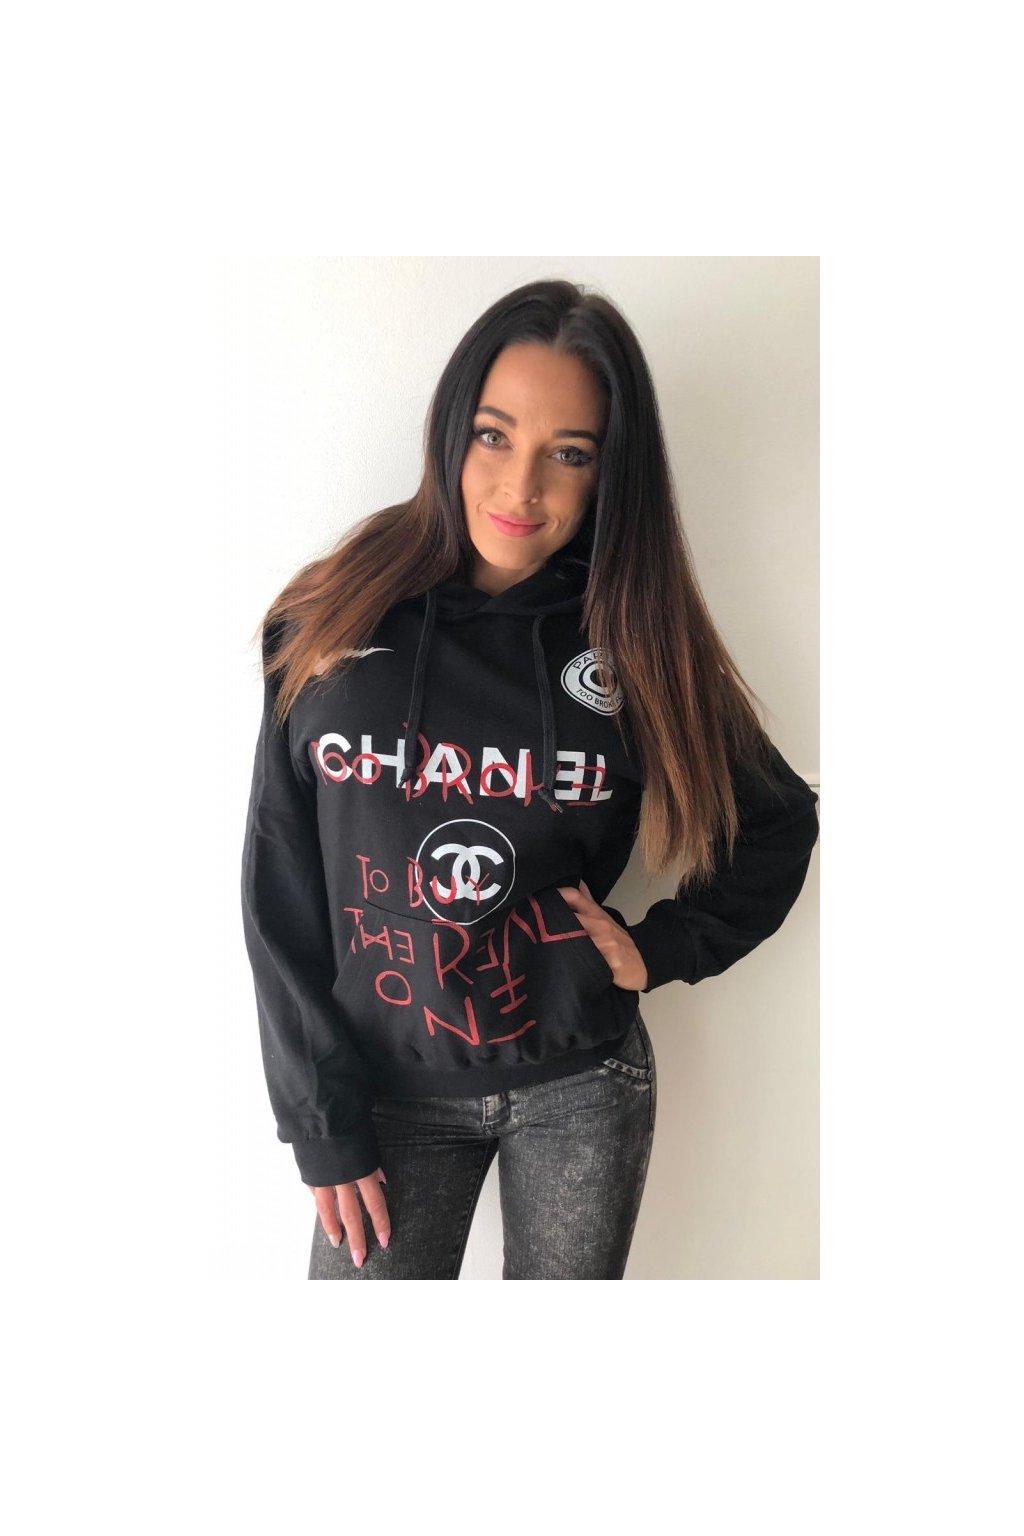 Mikina TooBroke s nápisem Chanel - černá (Velikost Velikost S)